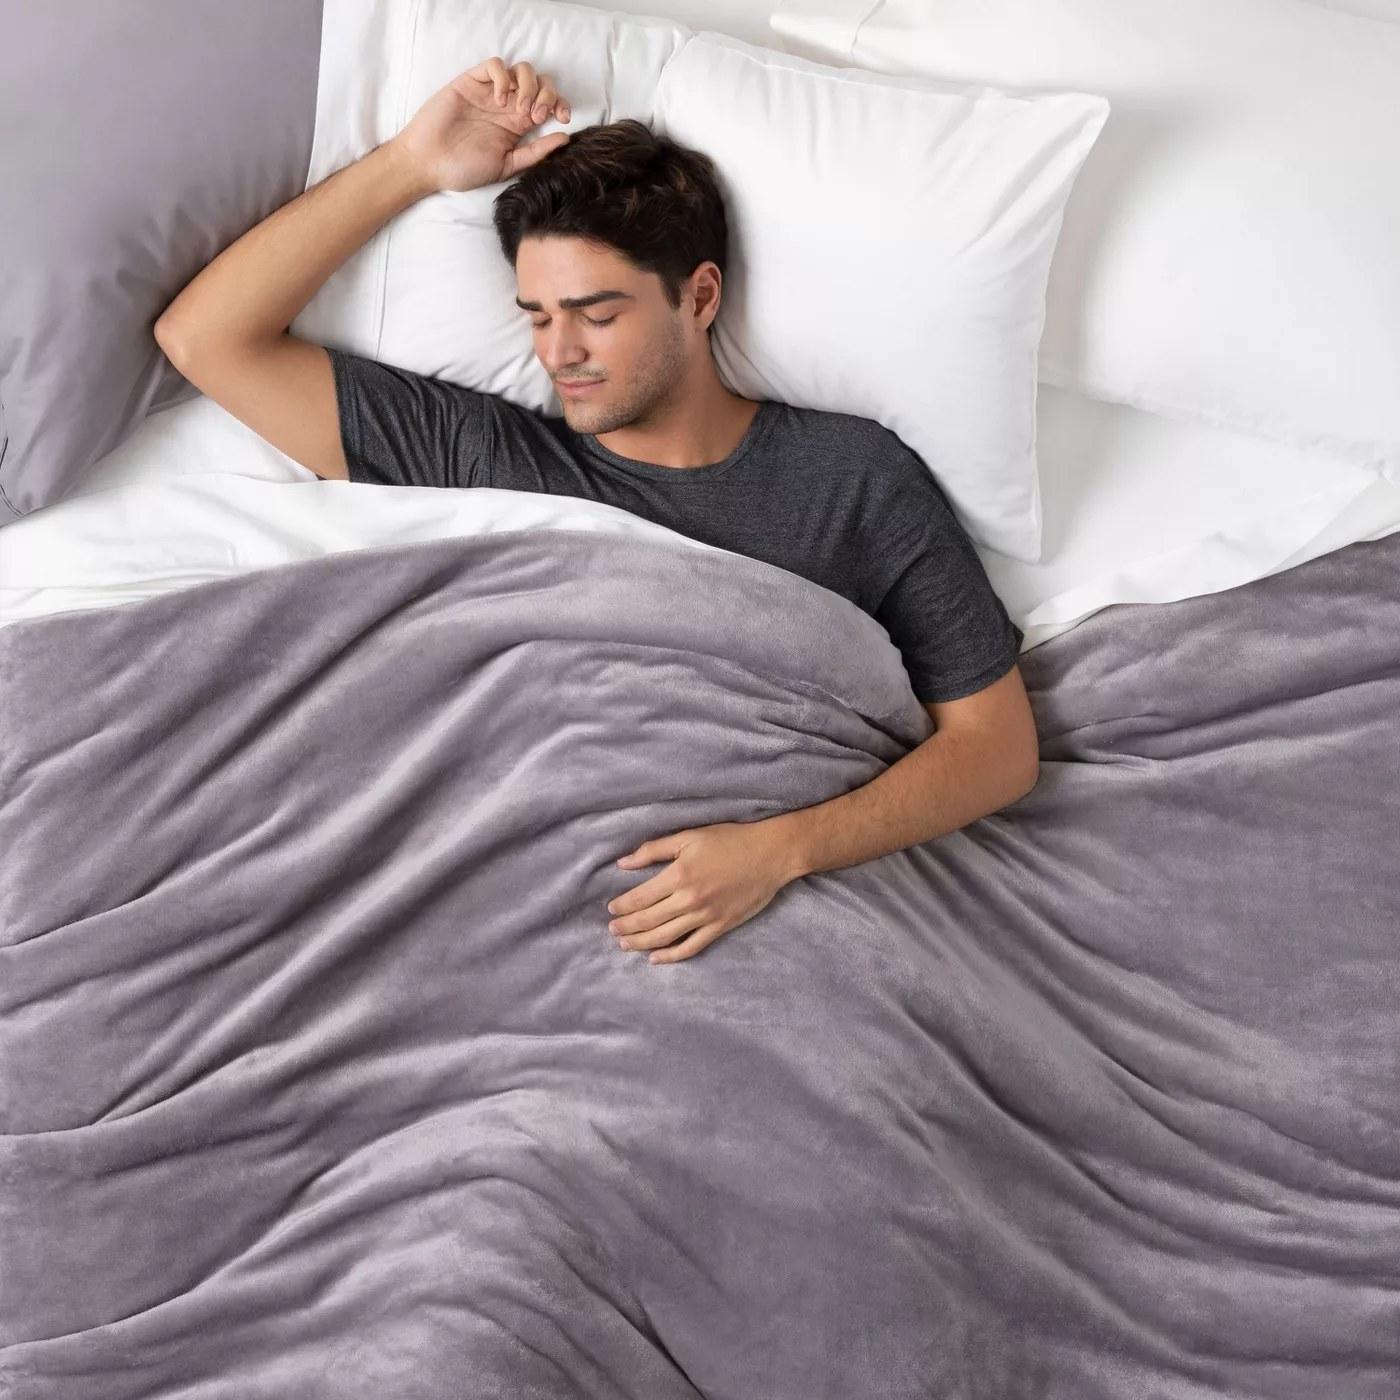 A model sleeping underneath the blanket